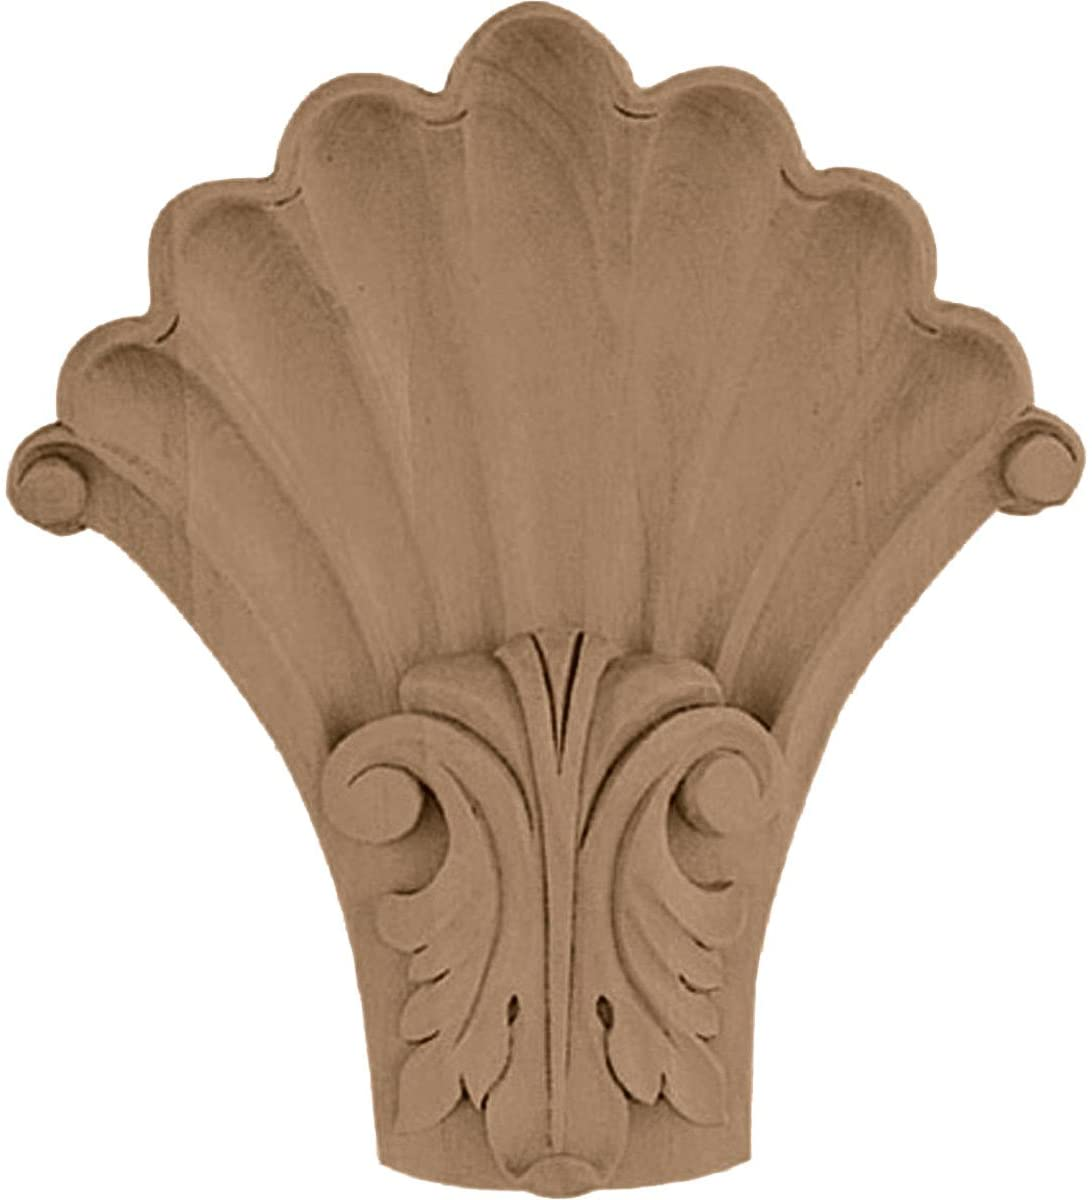 Ekena Millwork COR05X01X06SHCH-CASE-6 5 1/4 inch W x 2 inch D x 6 1/2 inch H Medium Acanthus in Shell Corbel, Cherry (6-Pack),